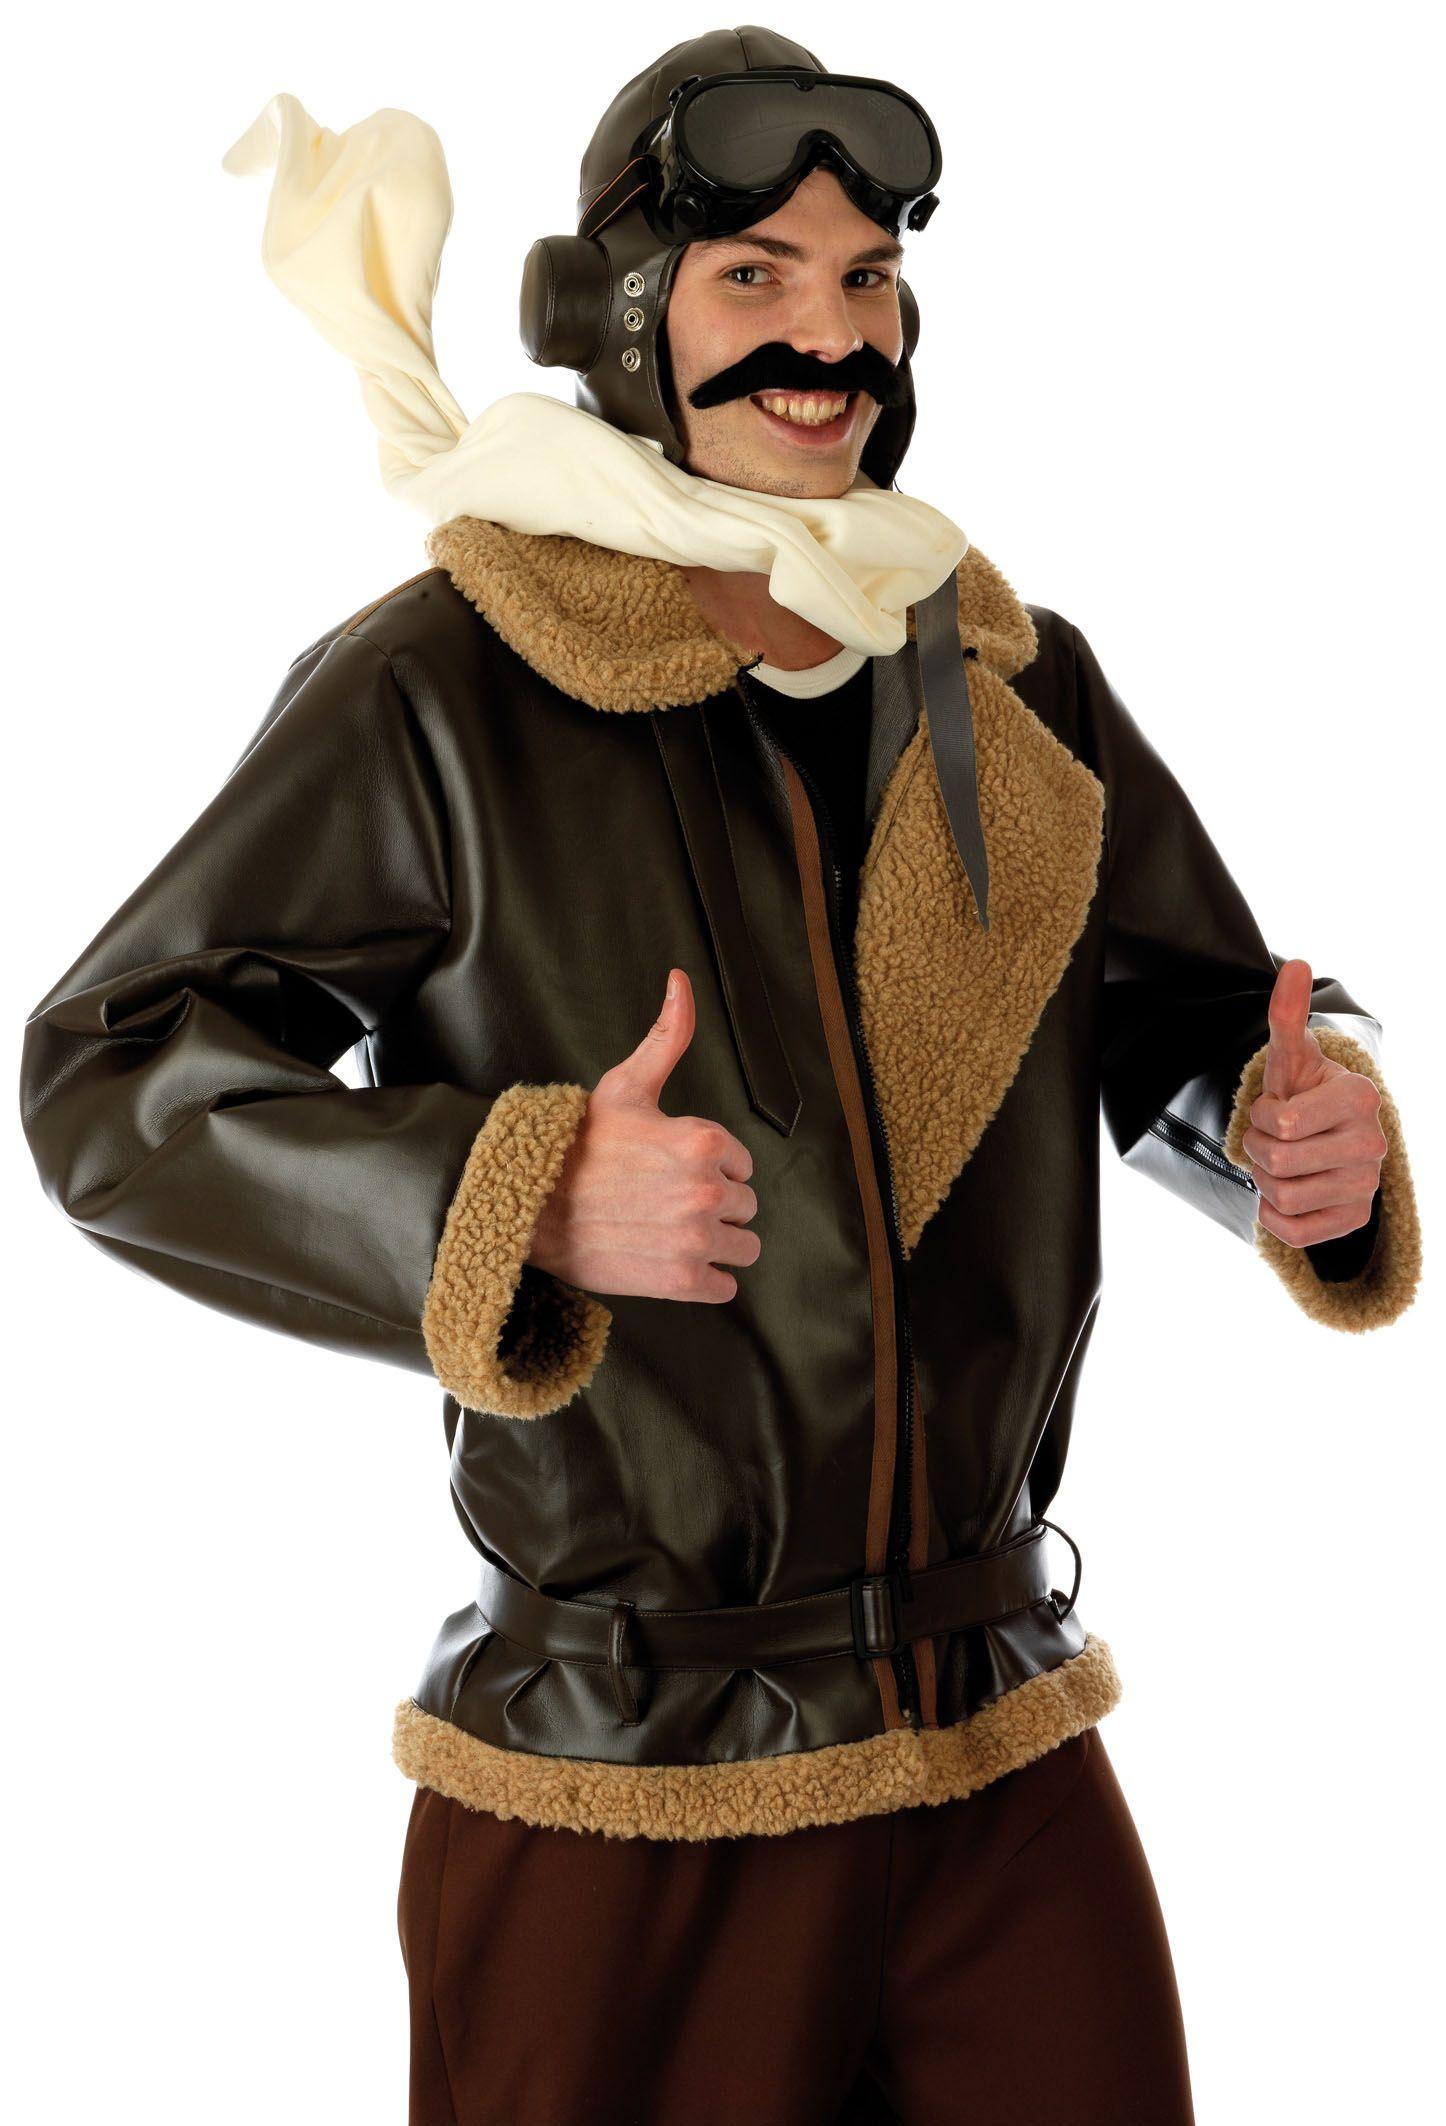 Details about Biggles WW2 War Fighter Pilot 1940s Mens Fancy Dress ...